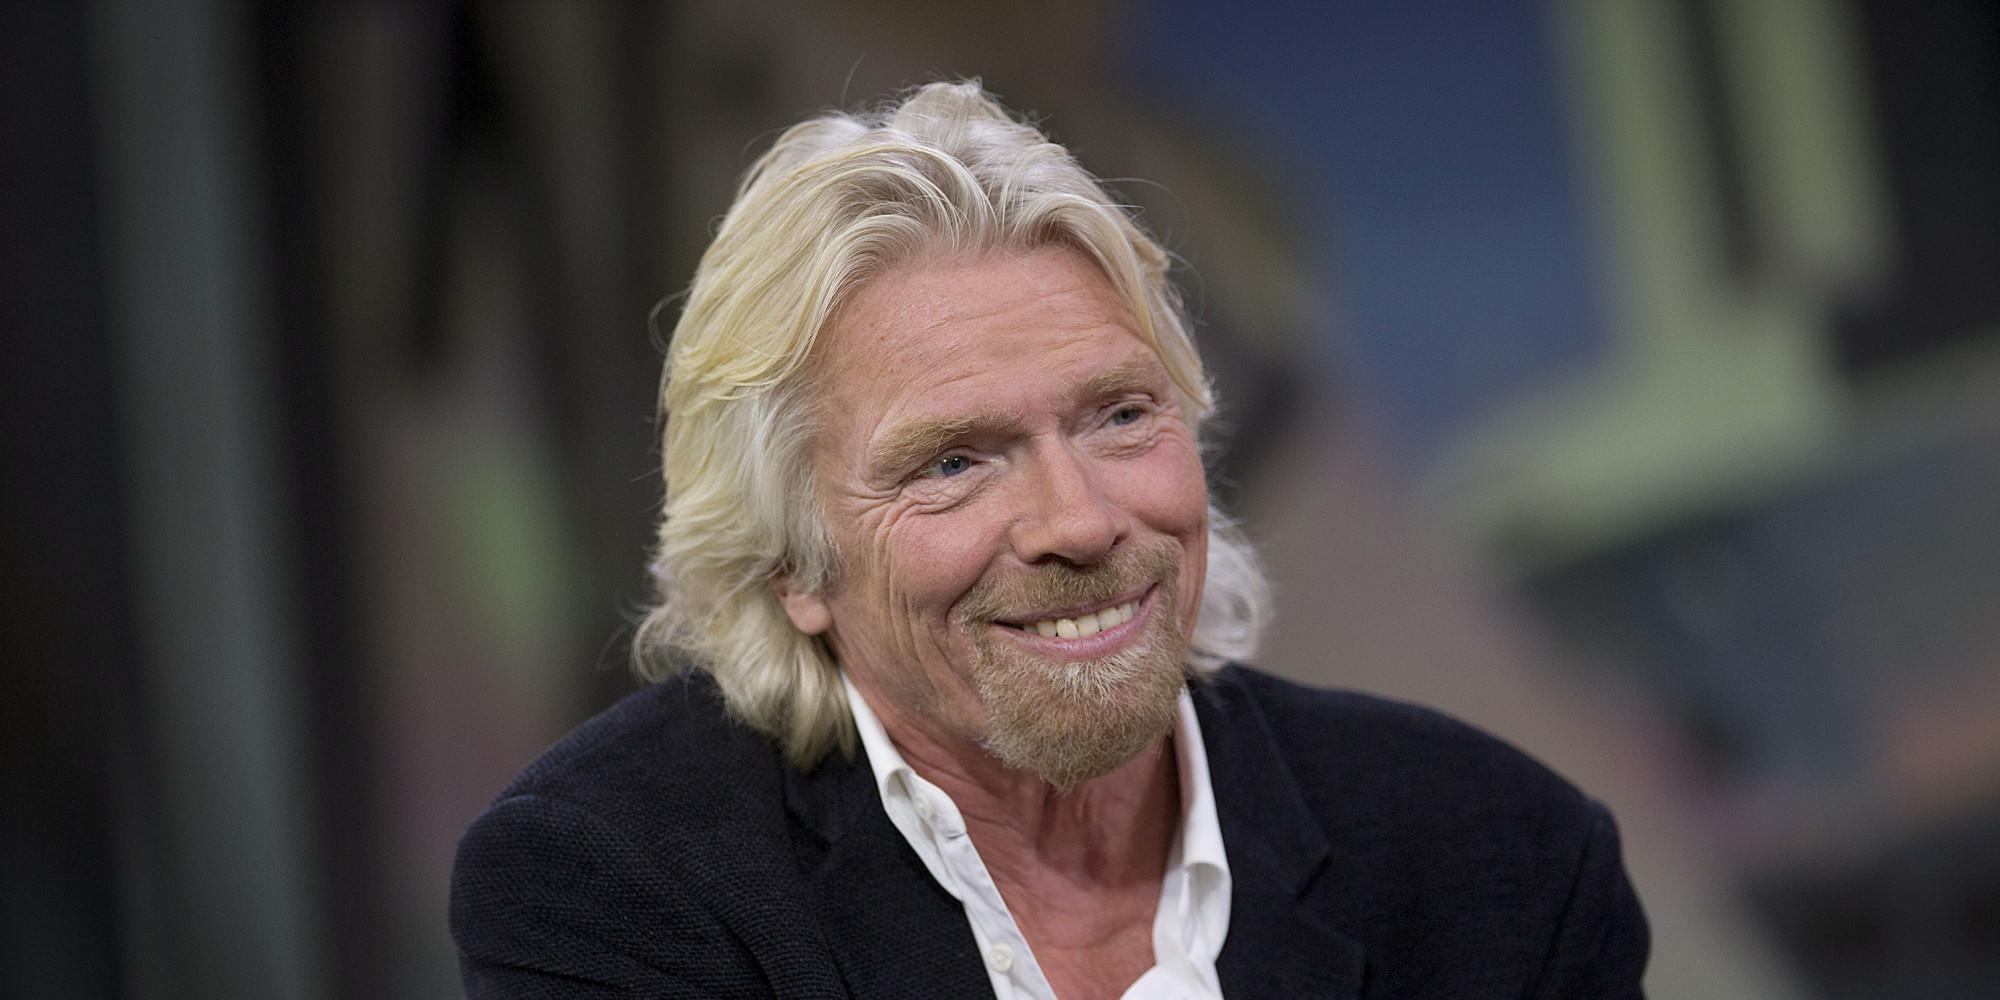 Chairman & Founder Of Virgin Group Ltd. Richard Branson Interview